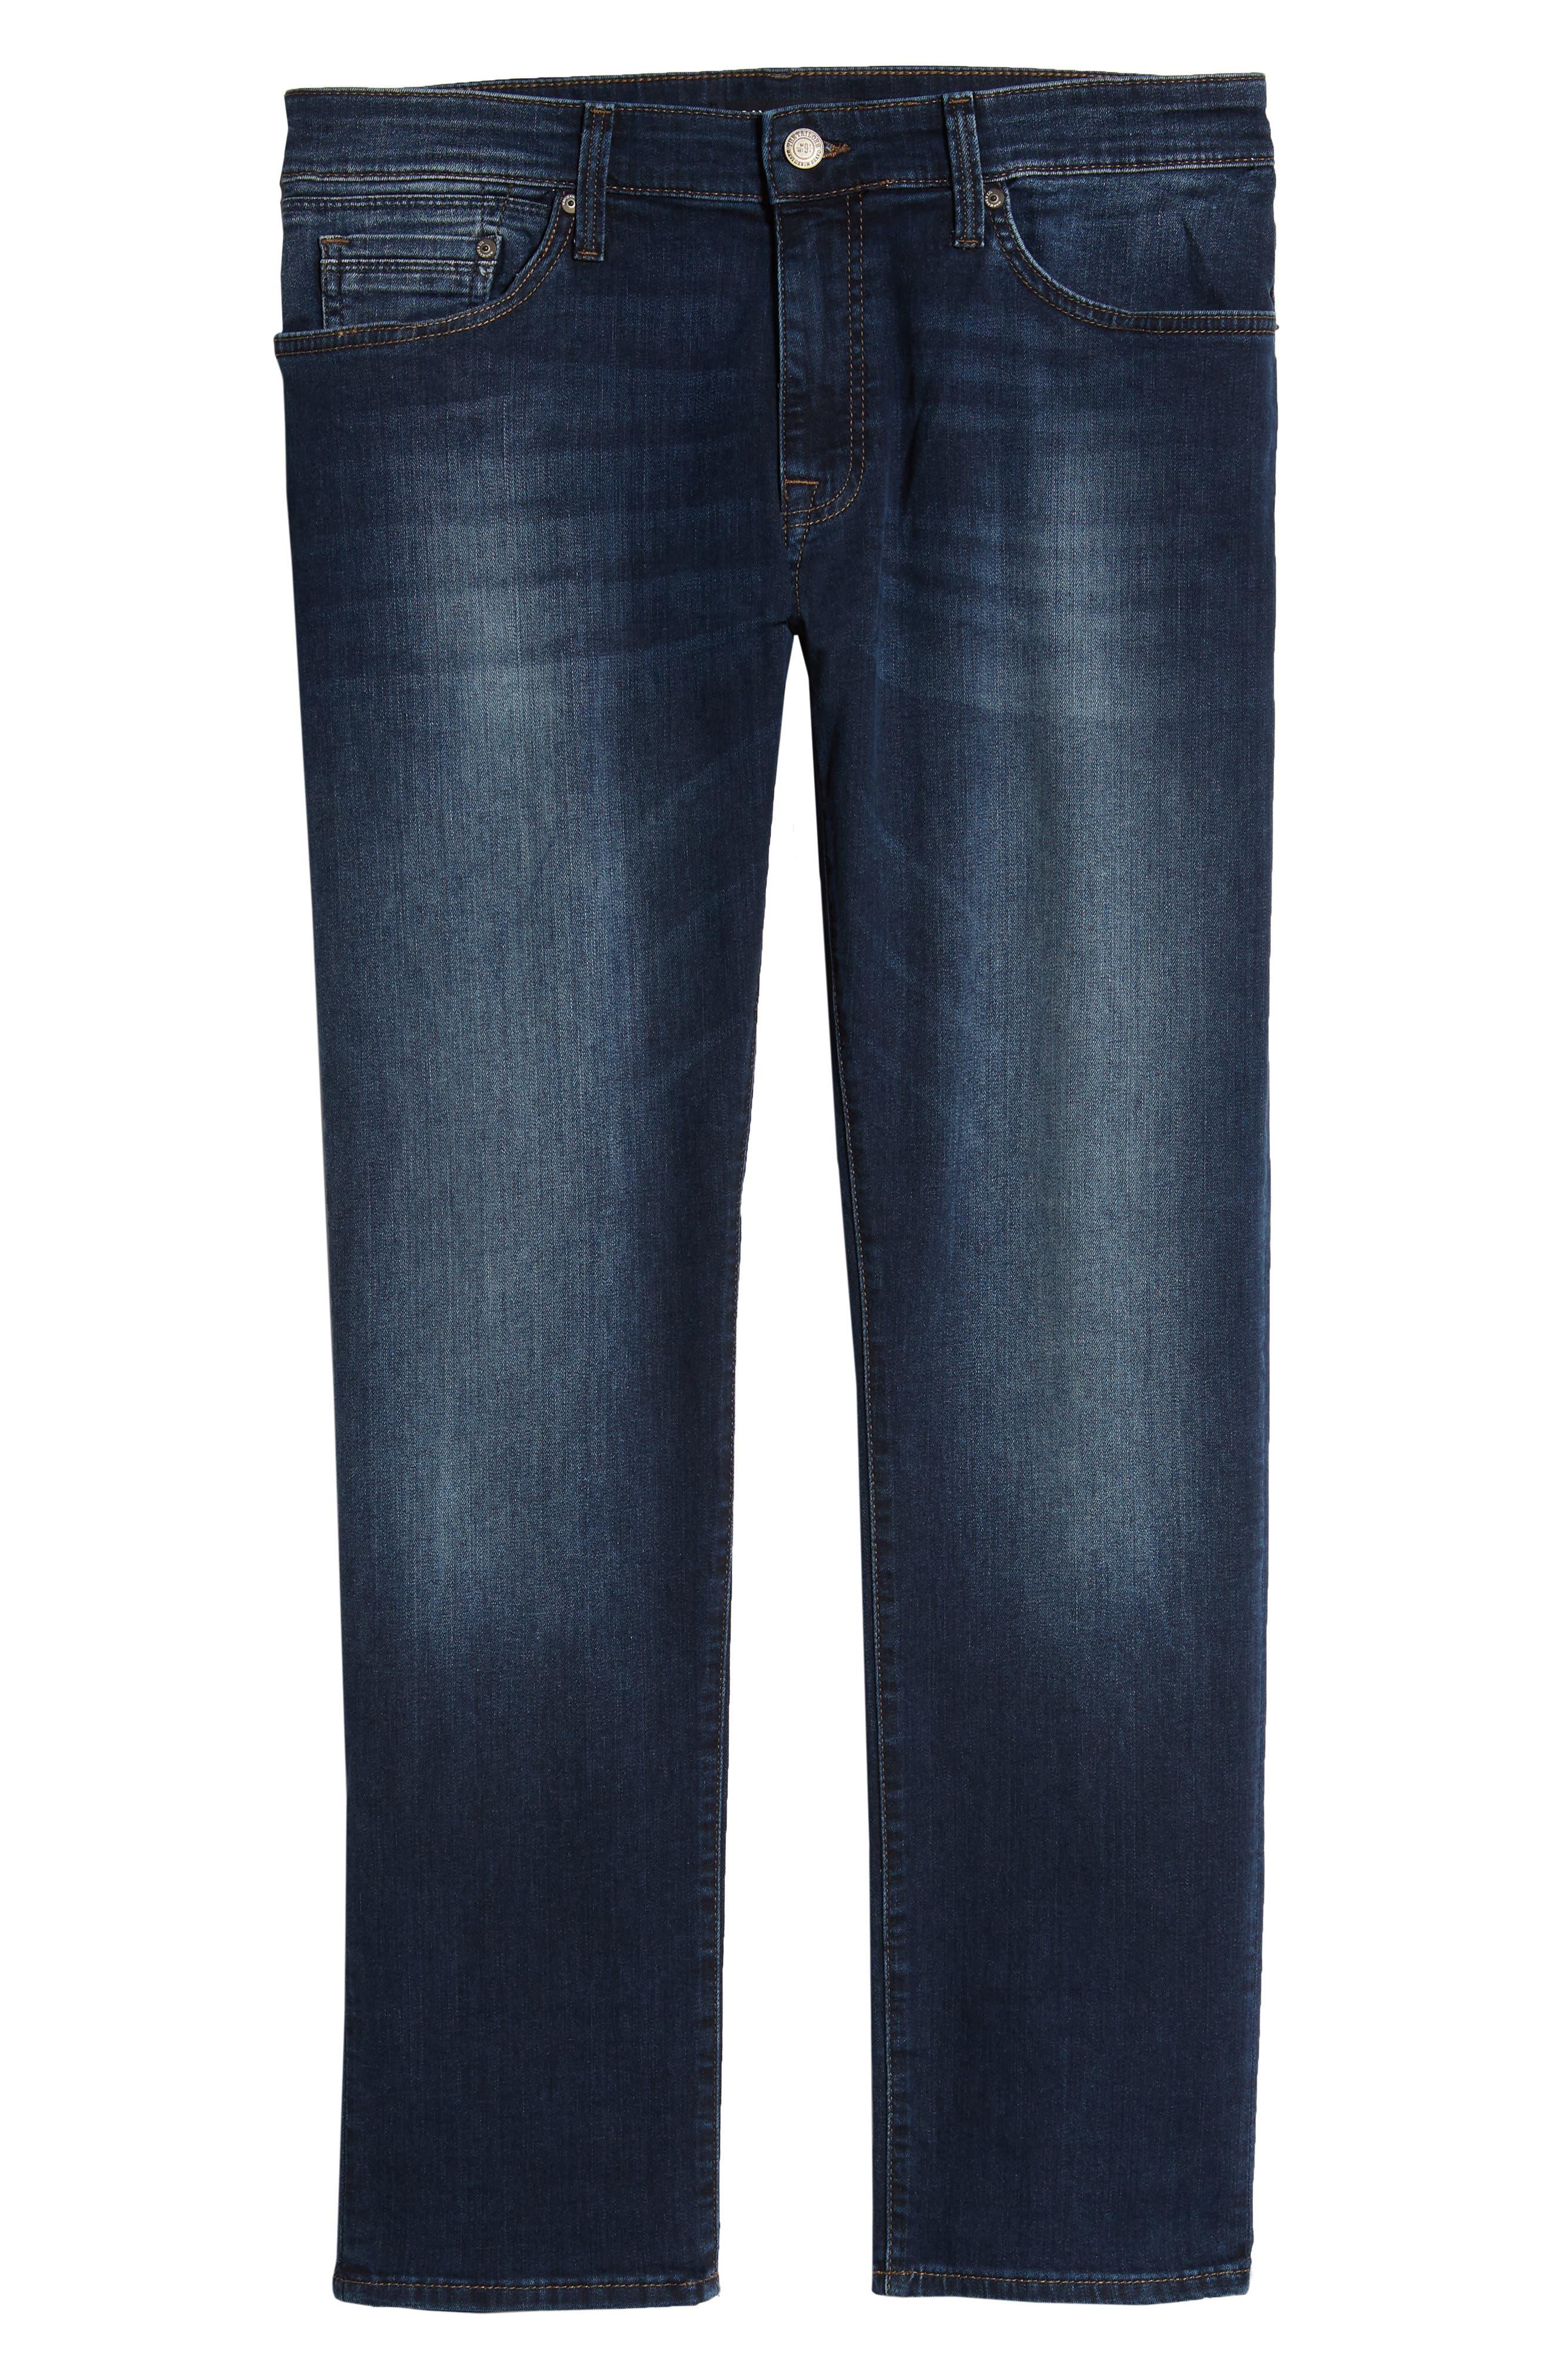 MAVI JEANS,                             Zach Straight Leg Jeans,                             Alternate thumbnail 3, color,                             DARK BRUSHED WILLIAMSBURG